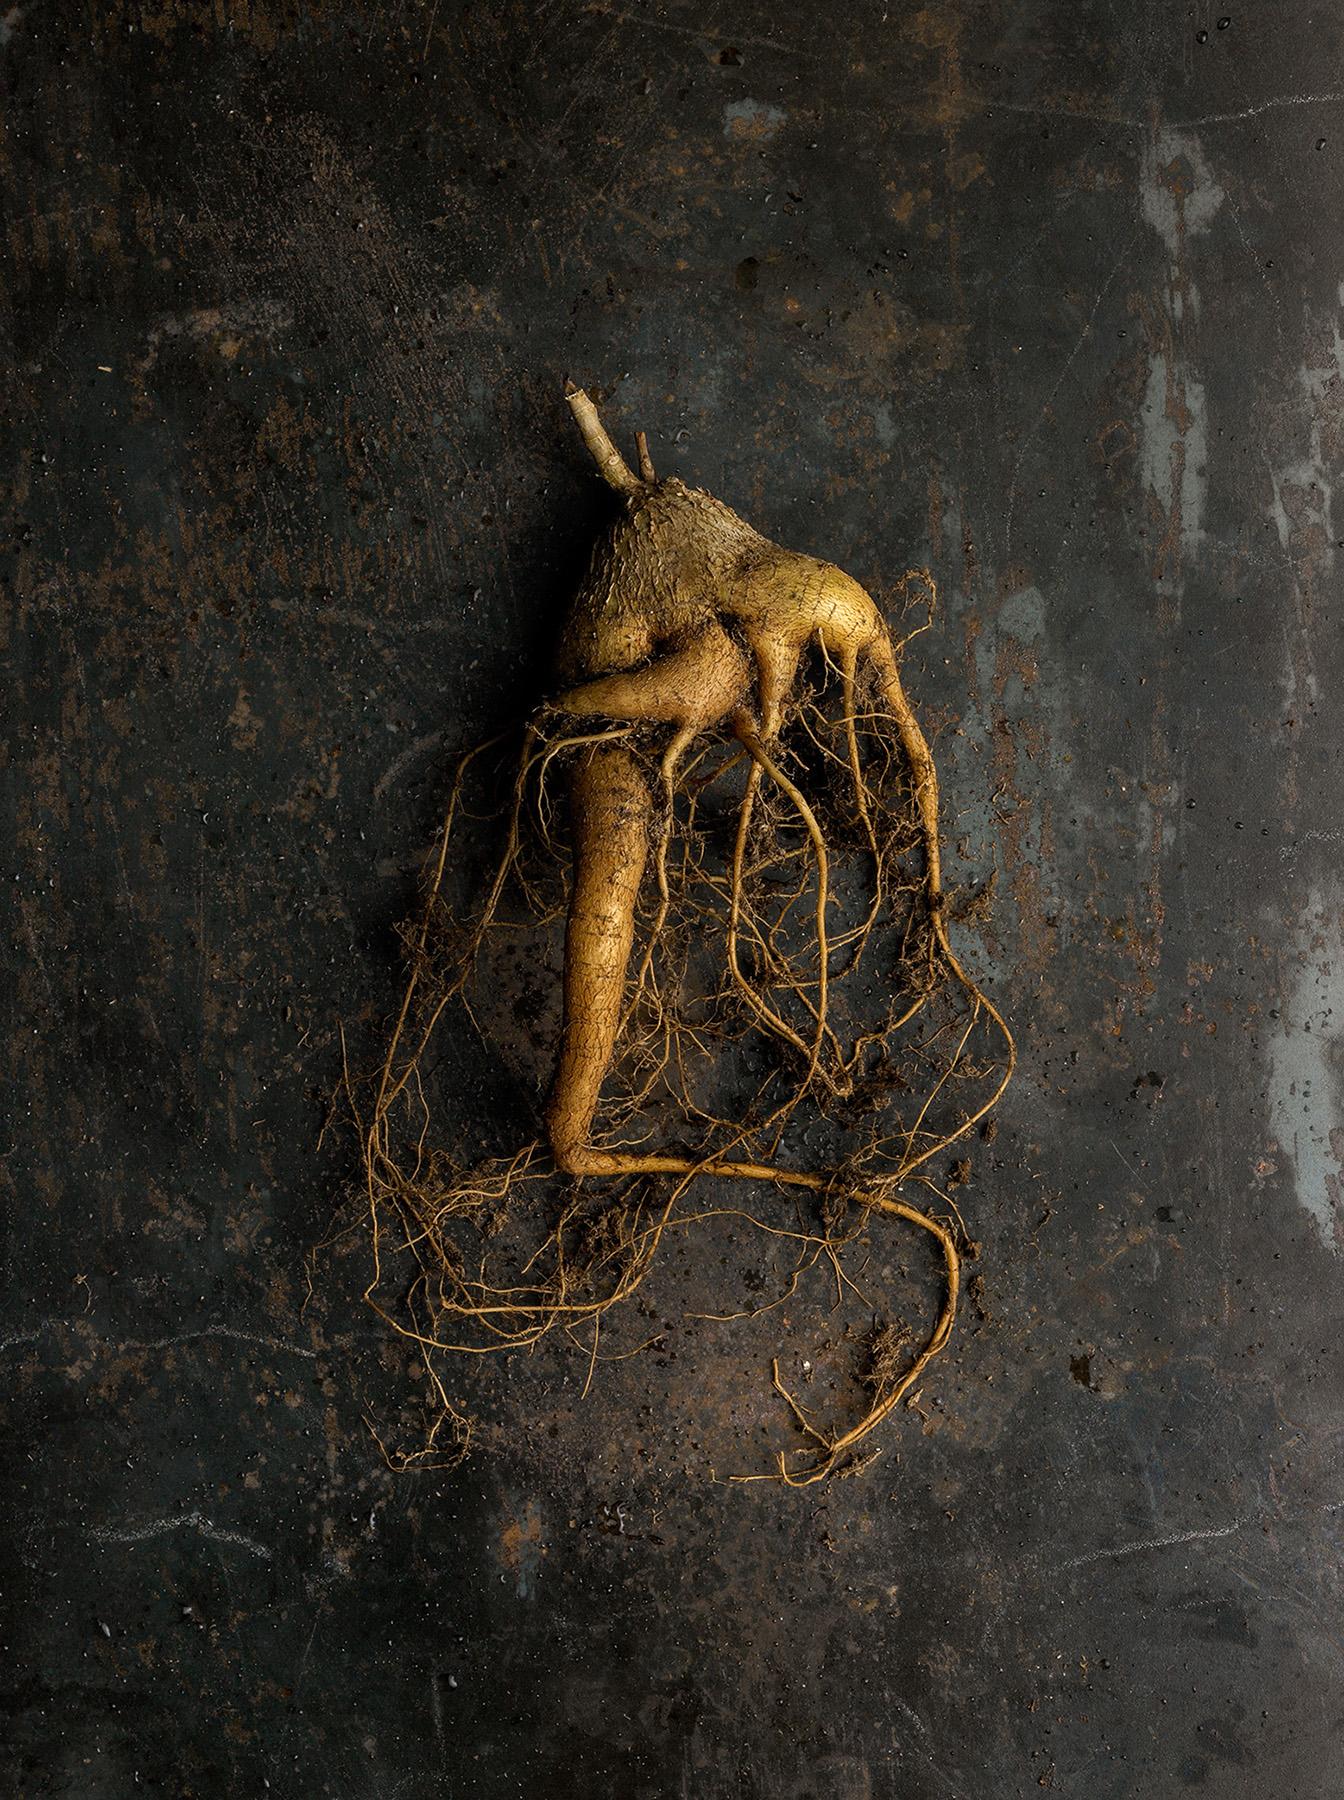 52_Beth_Galton_Roots_Wild_Ginger_1.jpg